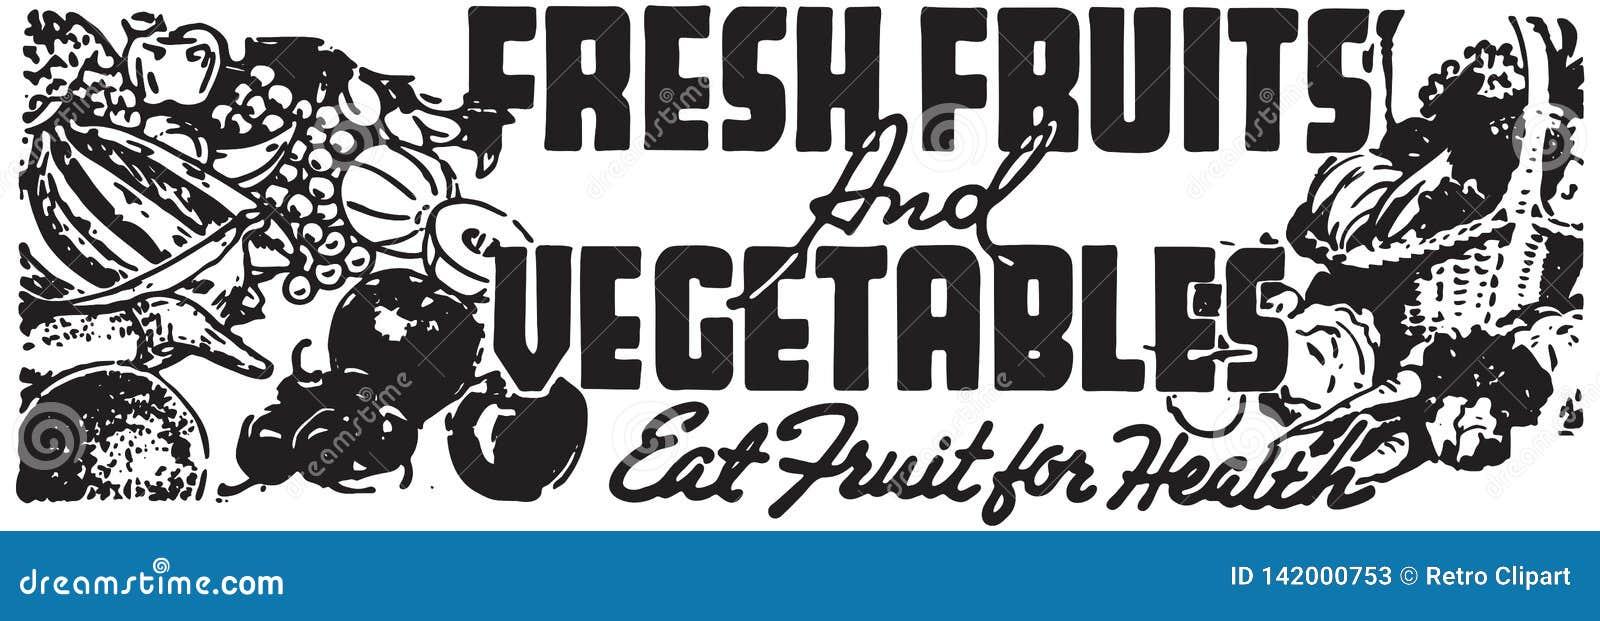 Verse Vruchten en Groenten 2